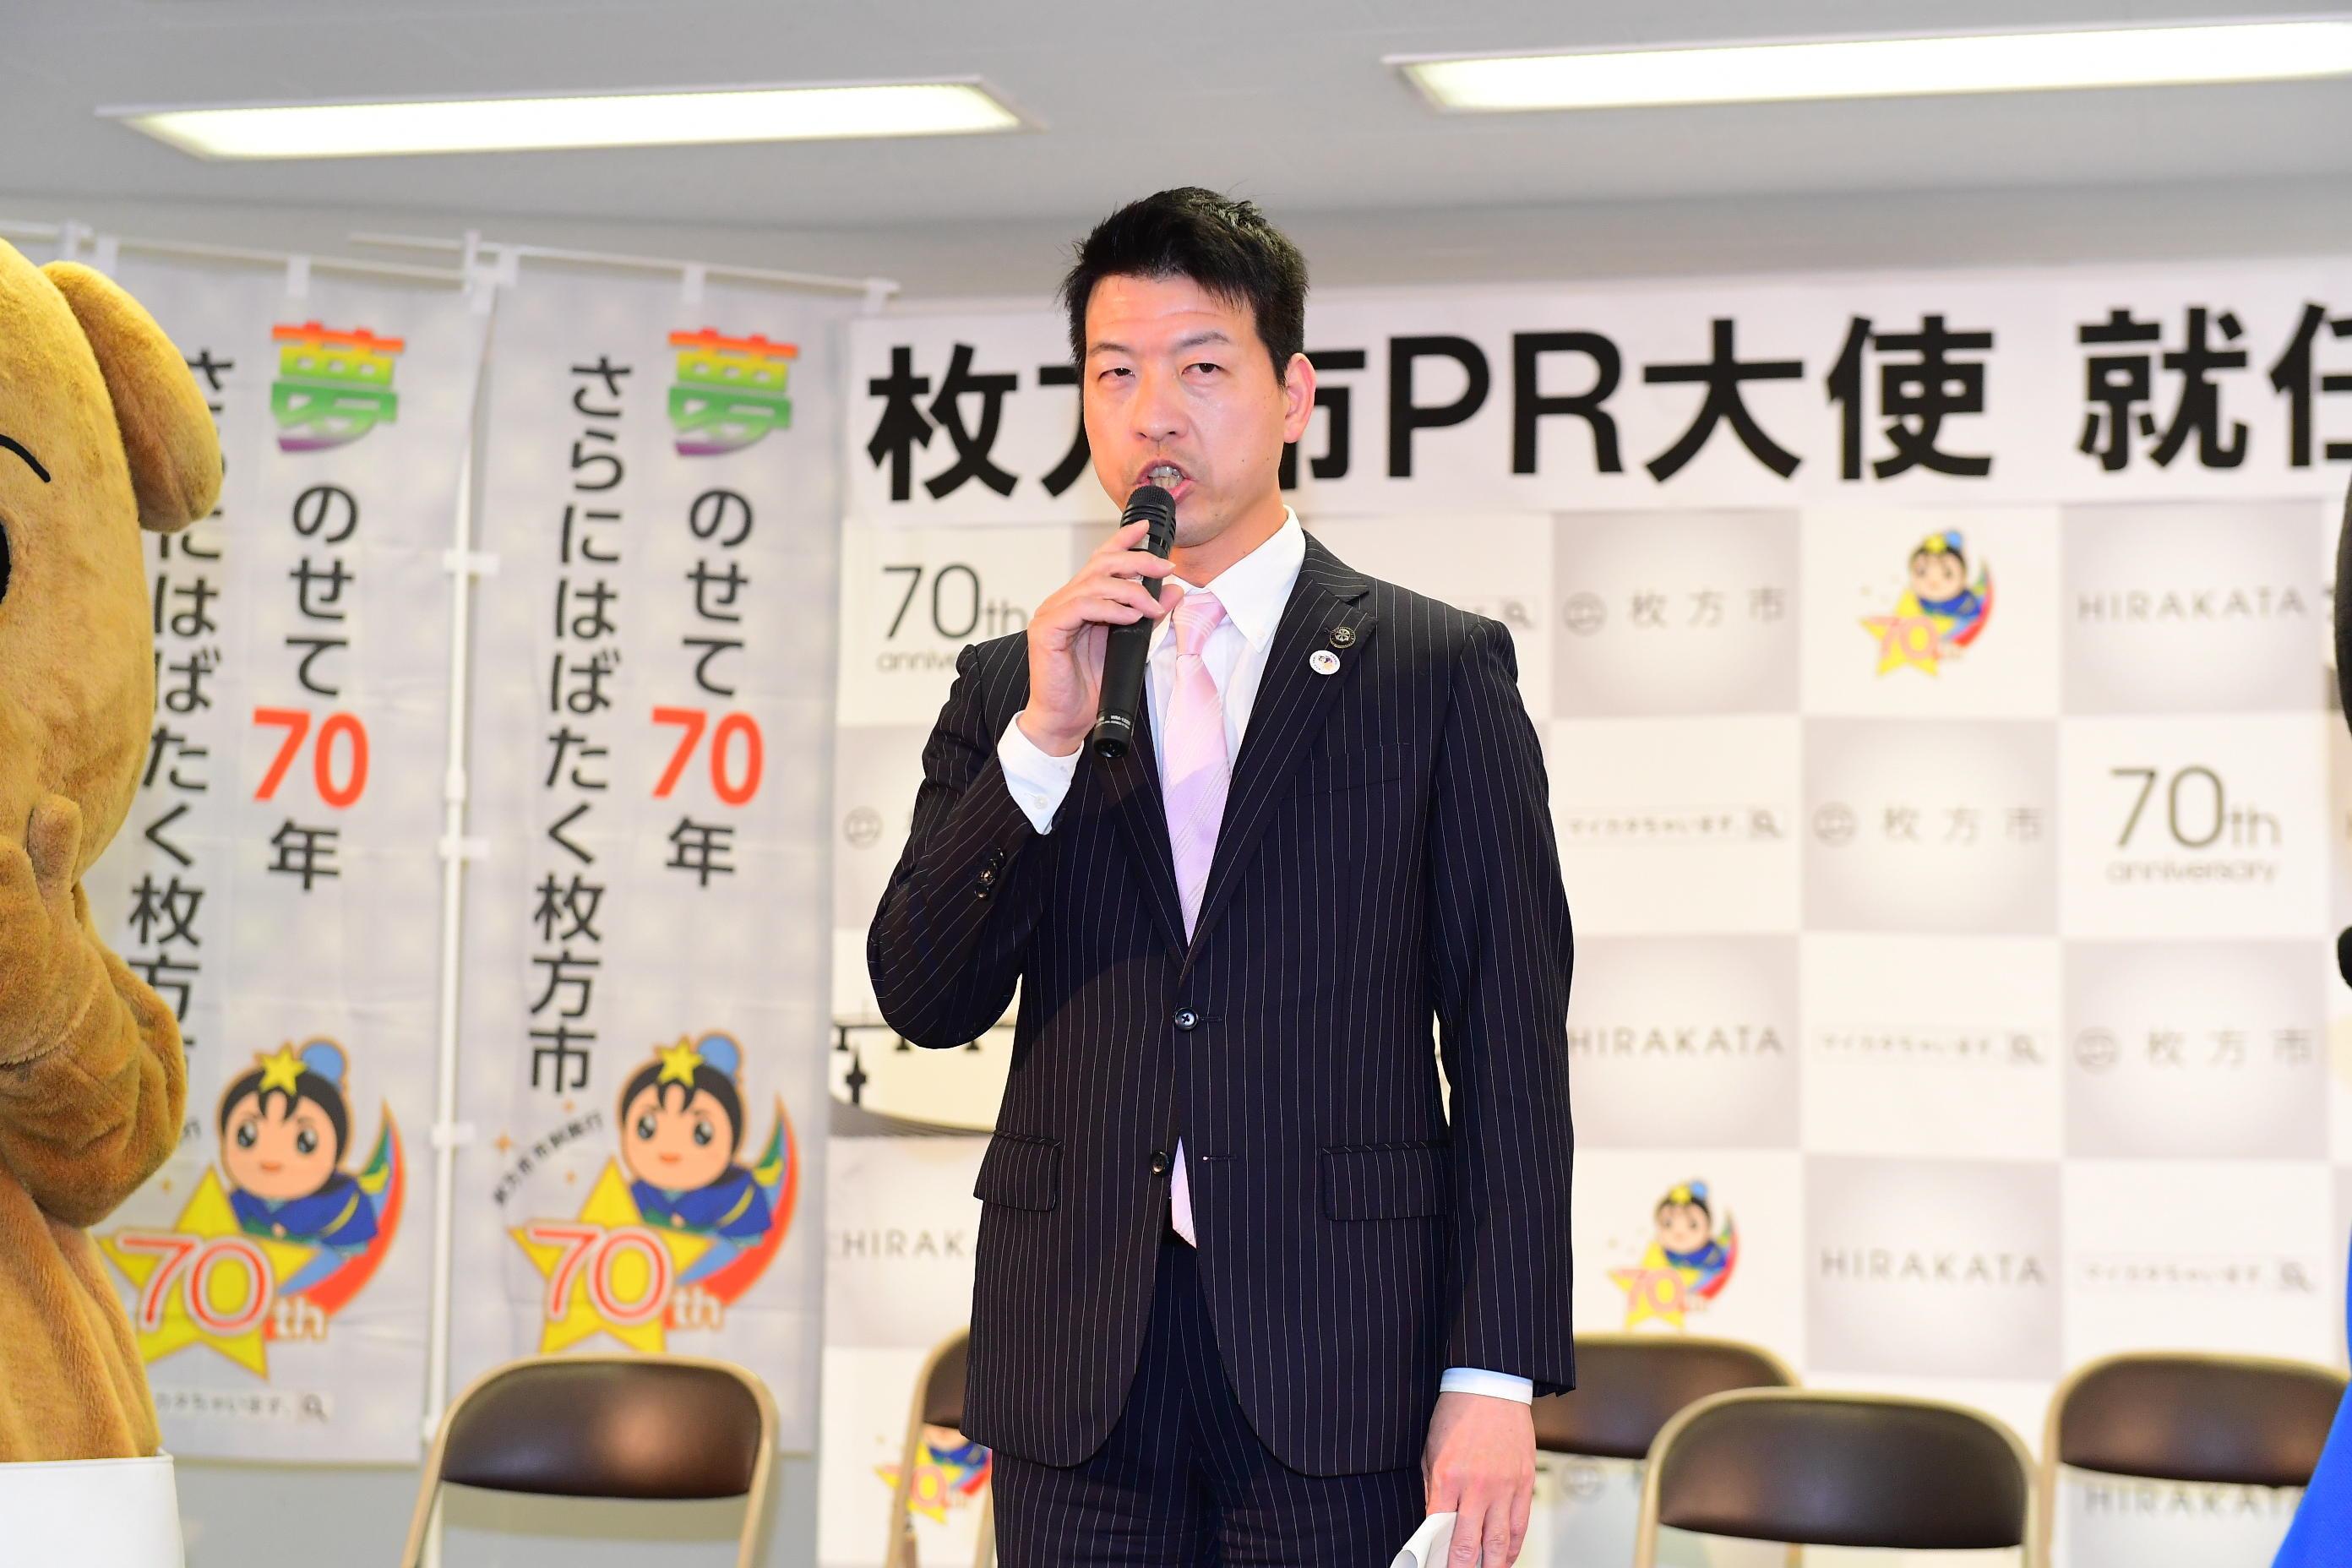 http://news.yoshimoto.co.jp/20170410172600-fa477ebc1a1f23a02abdee1f321bd3c294c5f464.jpg